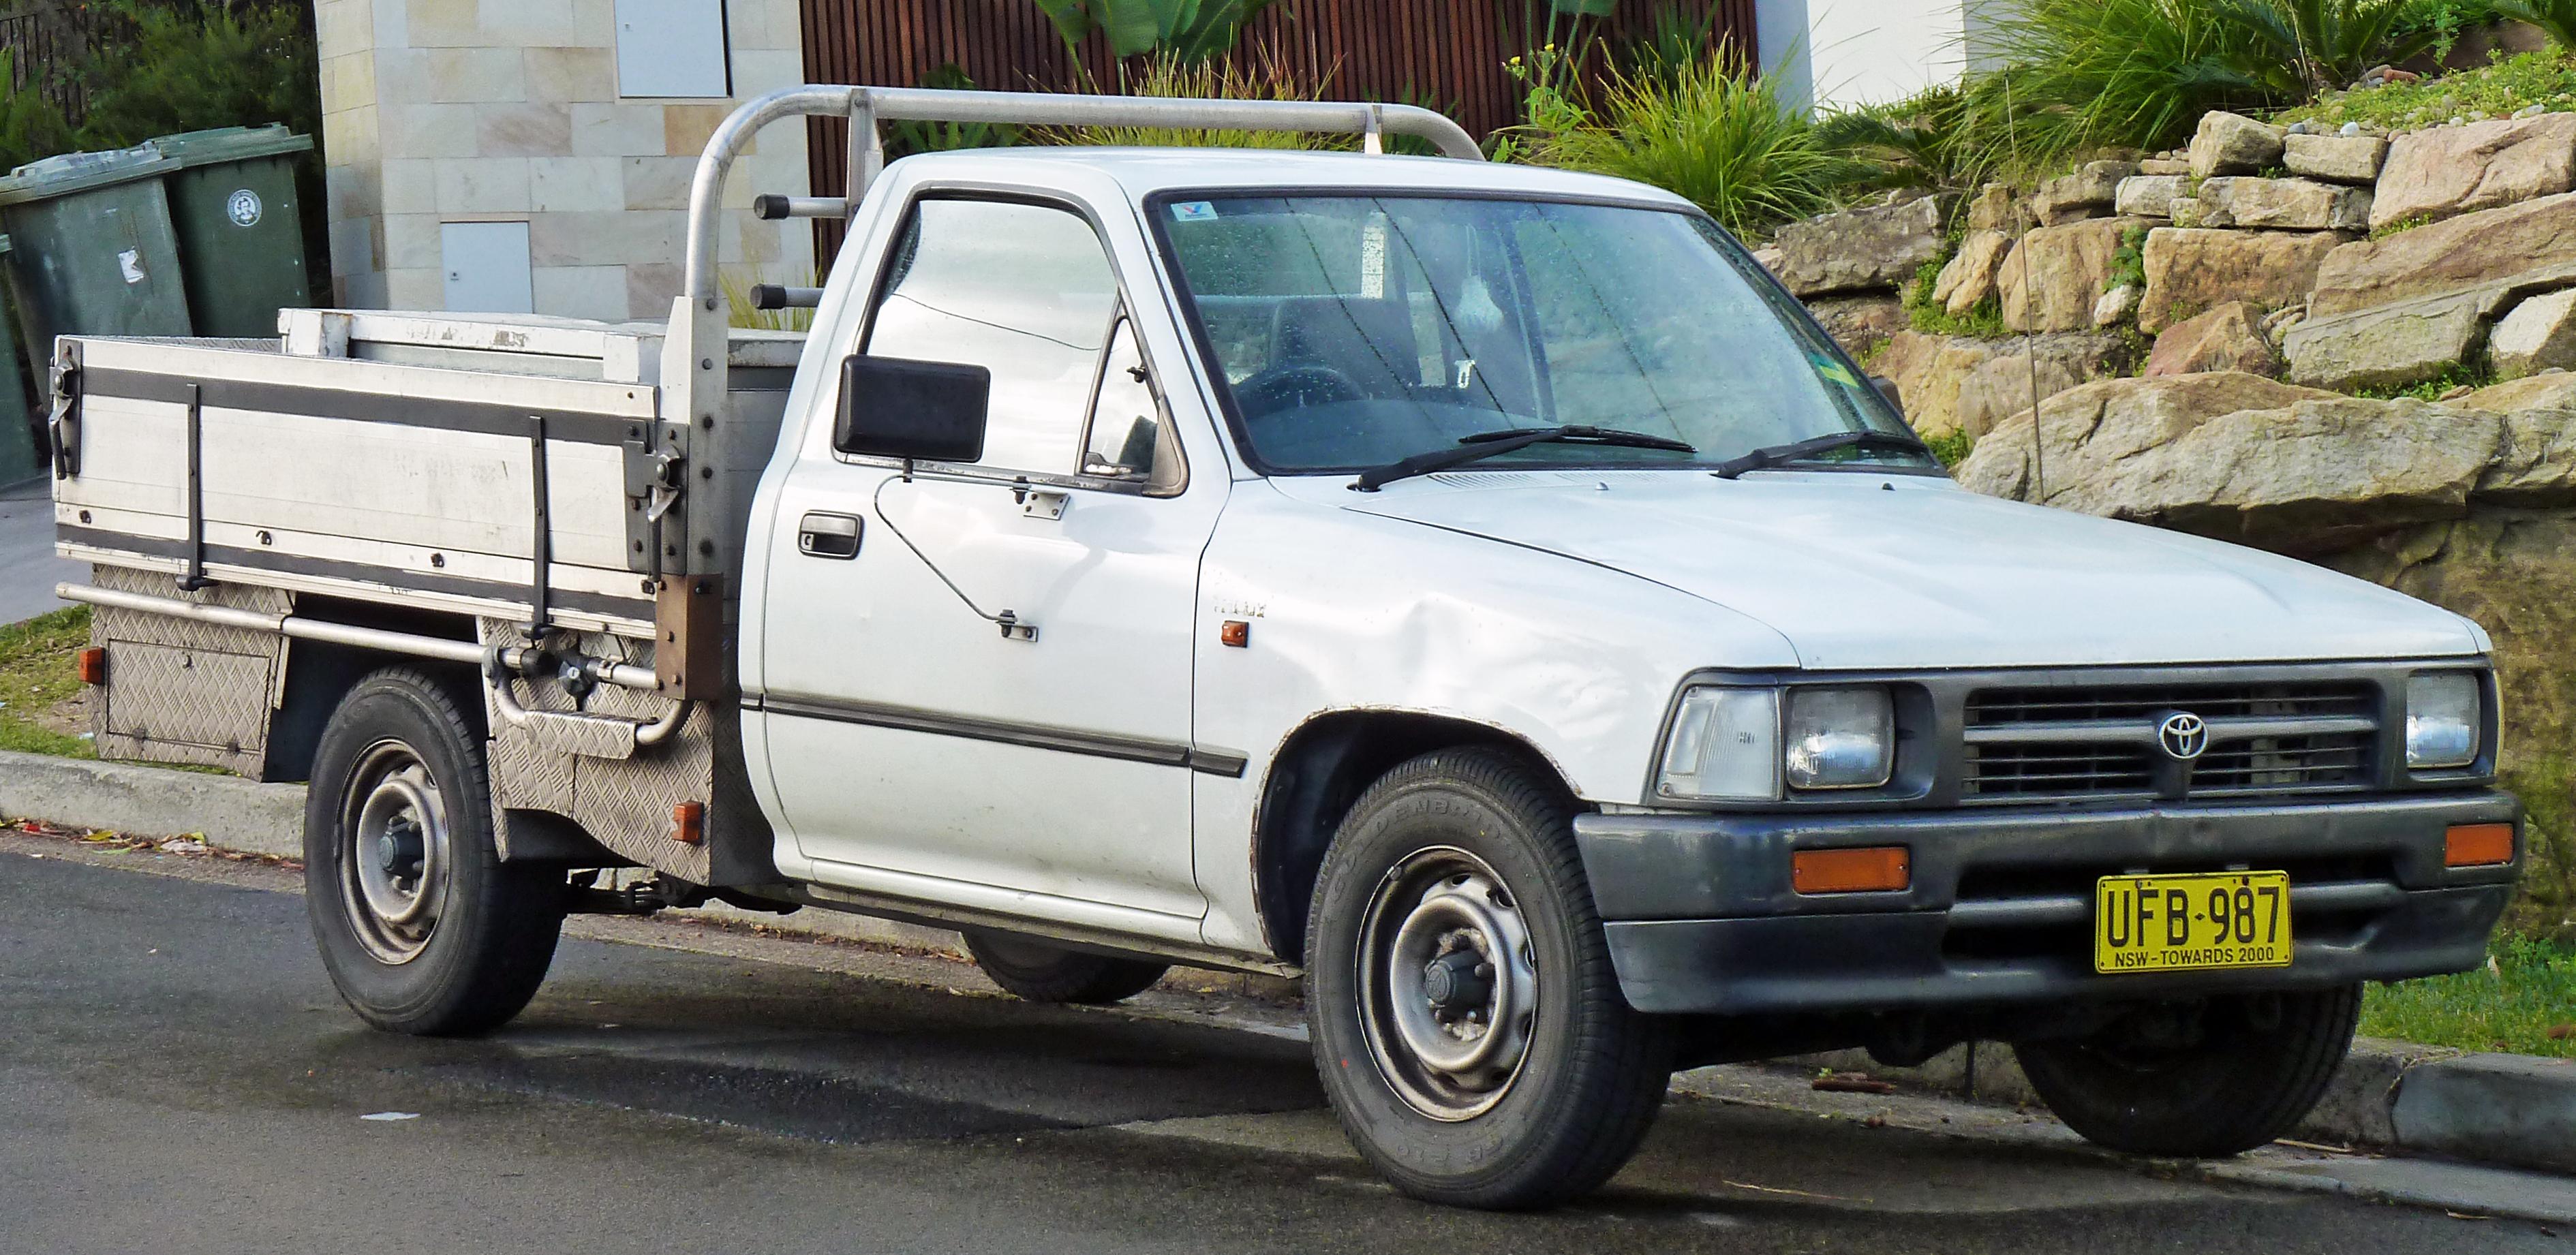 Kelebihan Kekurangan Toyota Hilux 1994 Top Model Tahun Ini